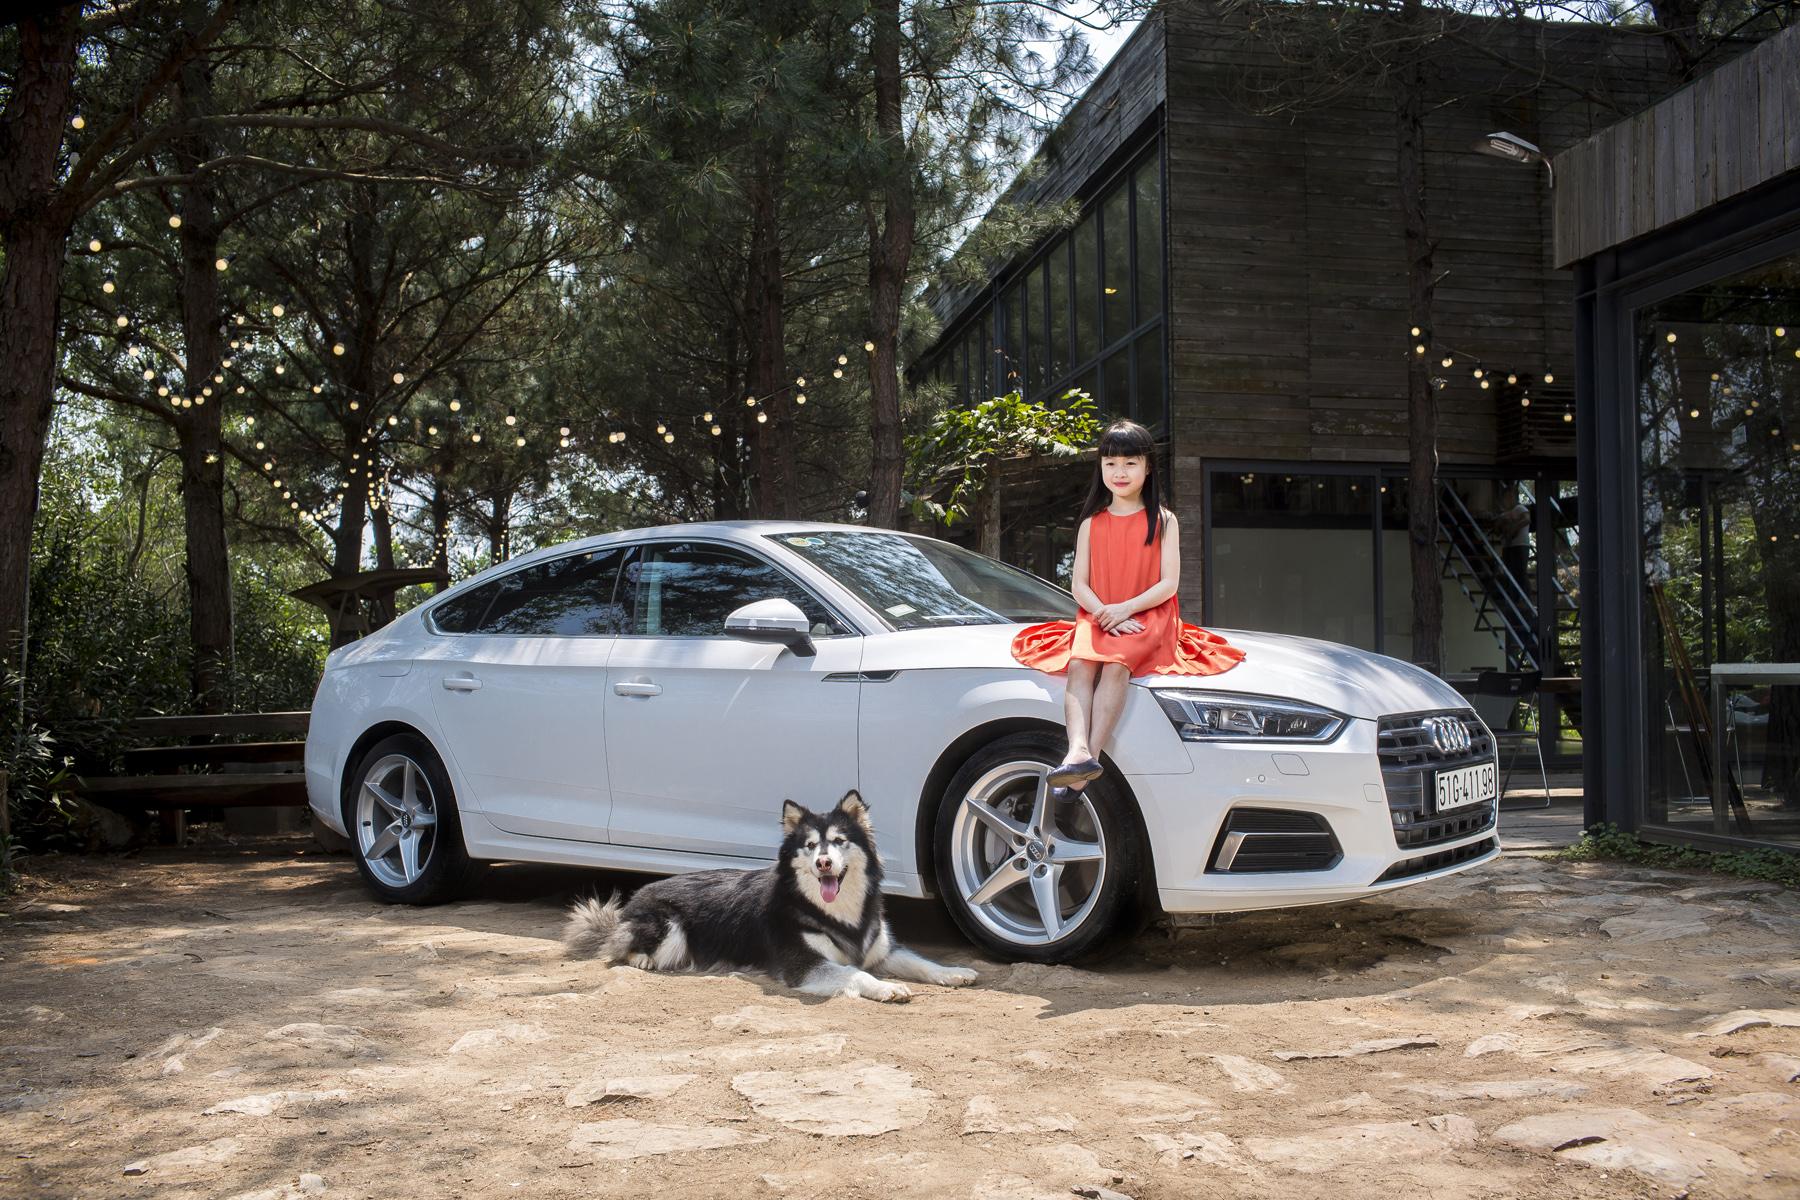 Audi-A5-Sportback-moi-tai-Viet-Nam-An-xang-it-hon-ma-manh-hon-anh-1